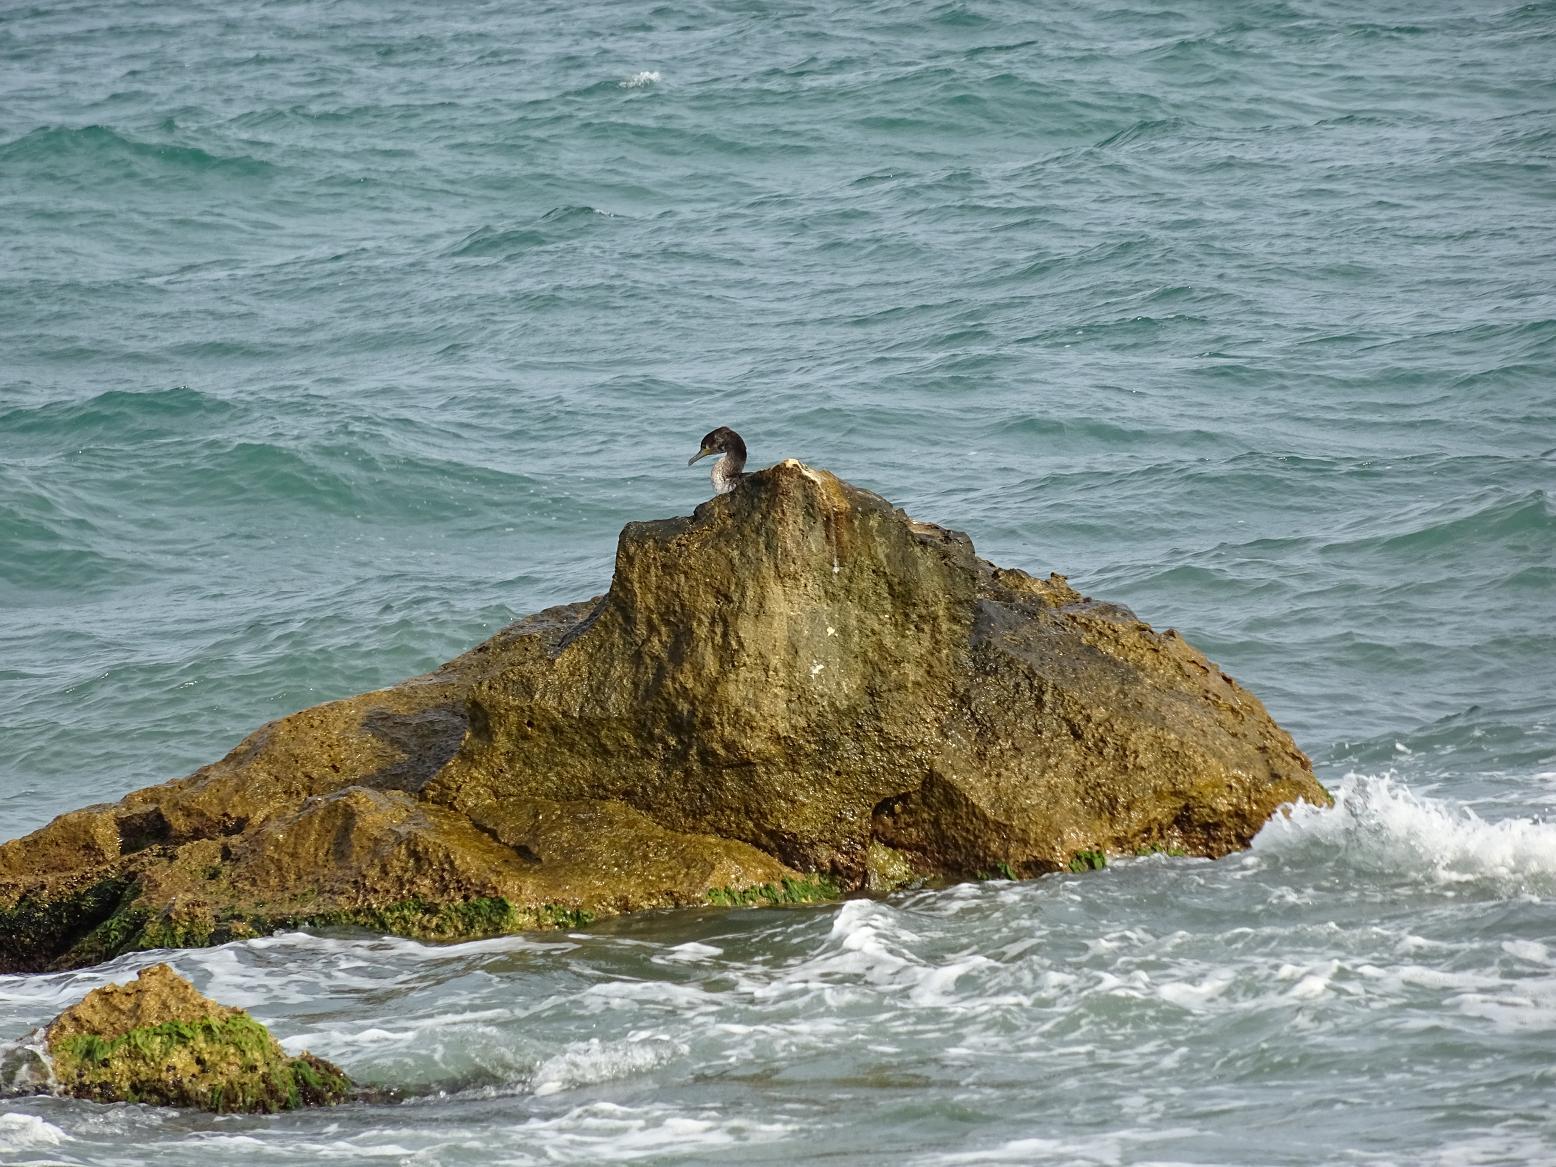 Большой баклан (Phalacrocorax carbo) Автор фото: Кирилова Любовь